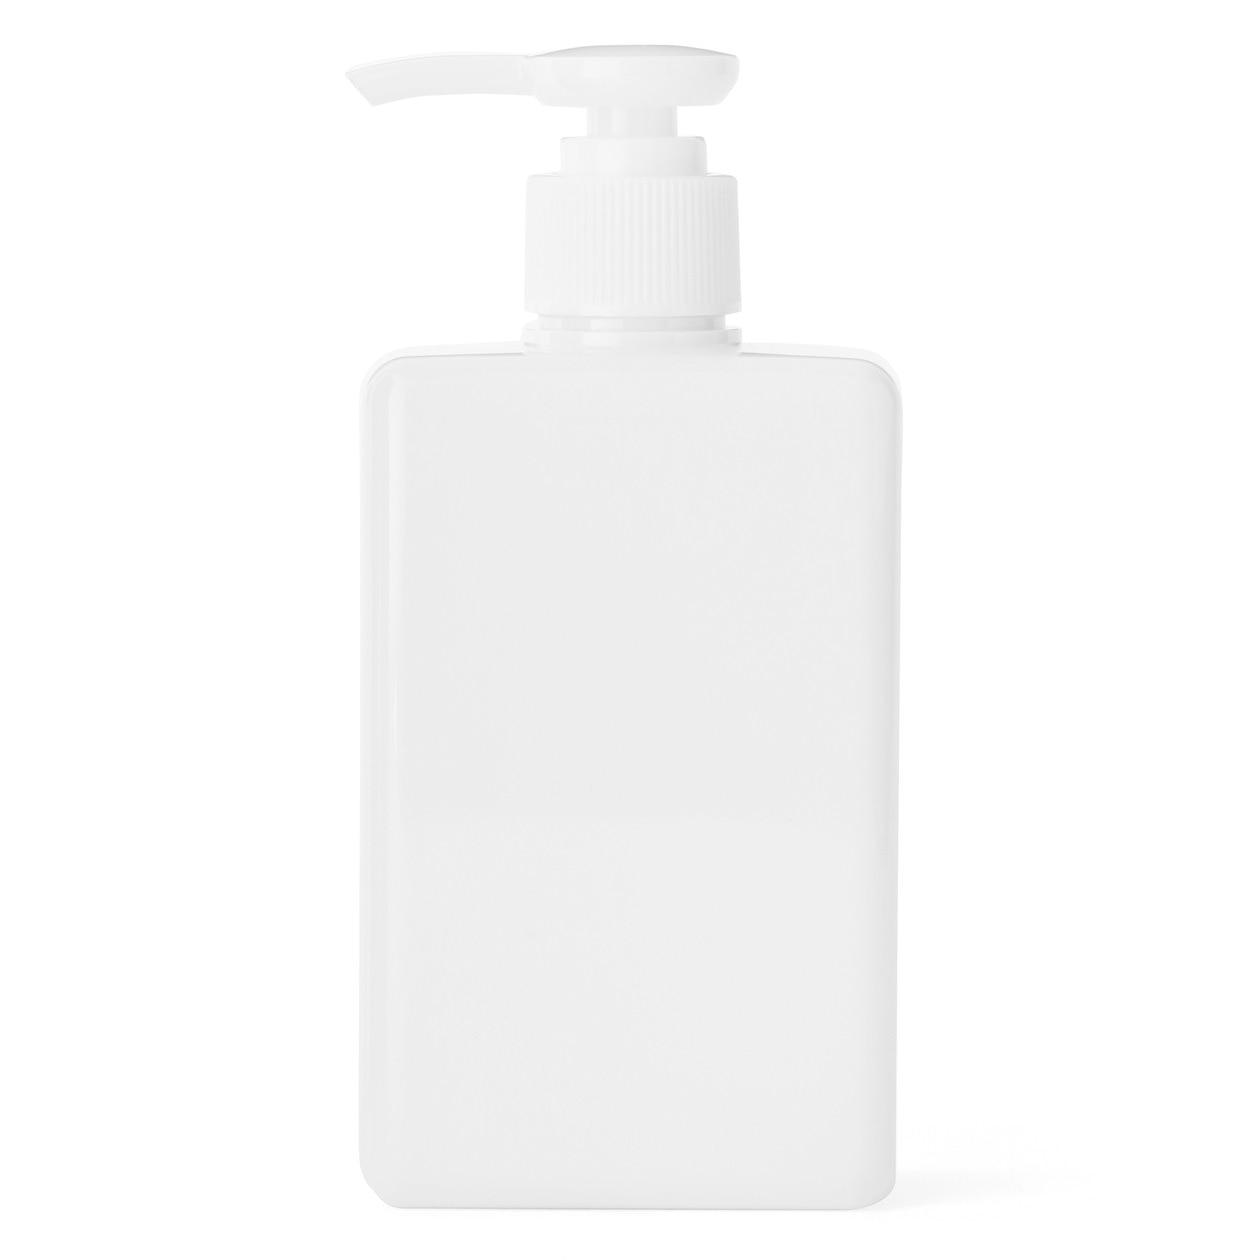 RoomClip商品情報 - PET詰替ボトル グリーン 280ml用 ホワイト 280ml用